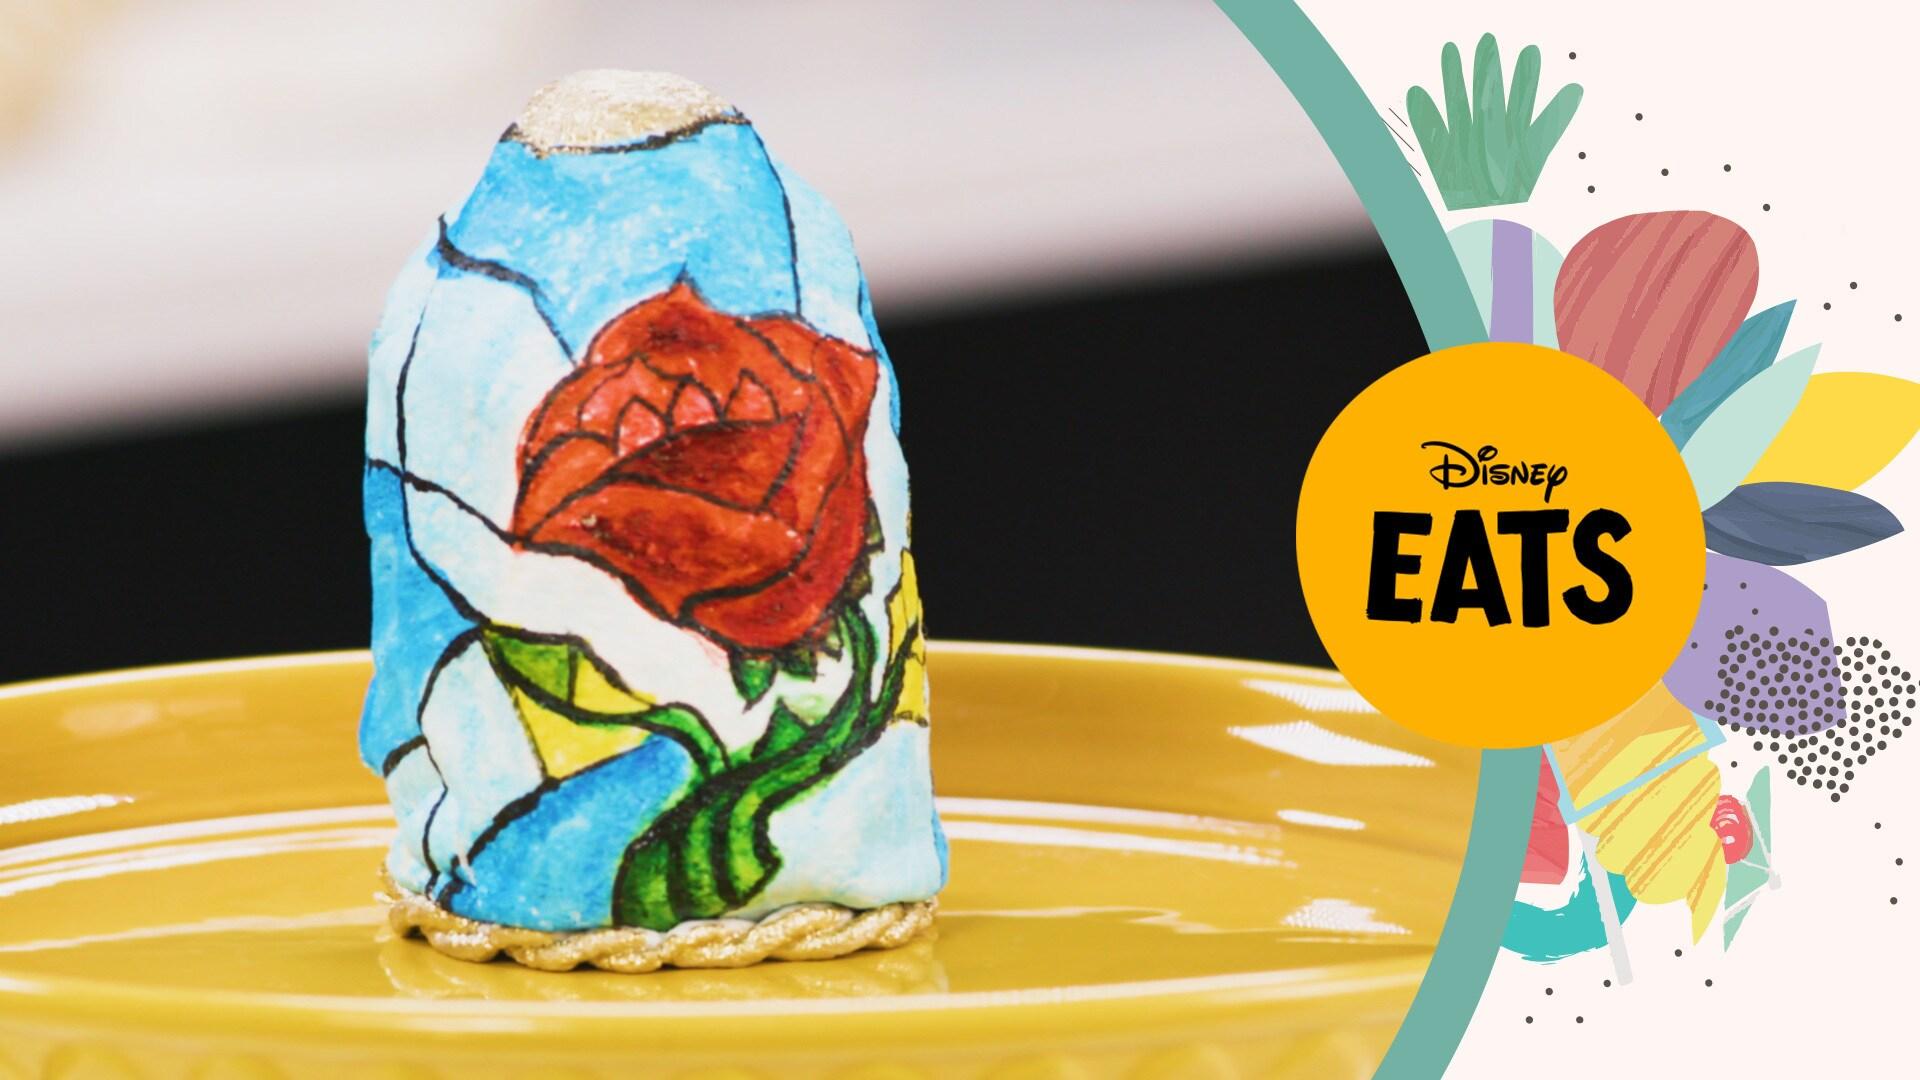 Beauty and the Beast Rose Cake | Disney Eats